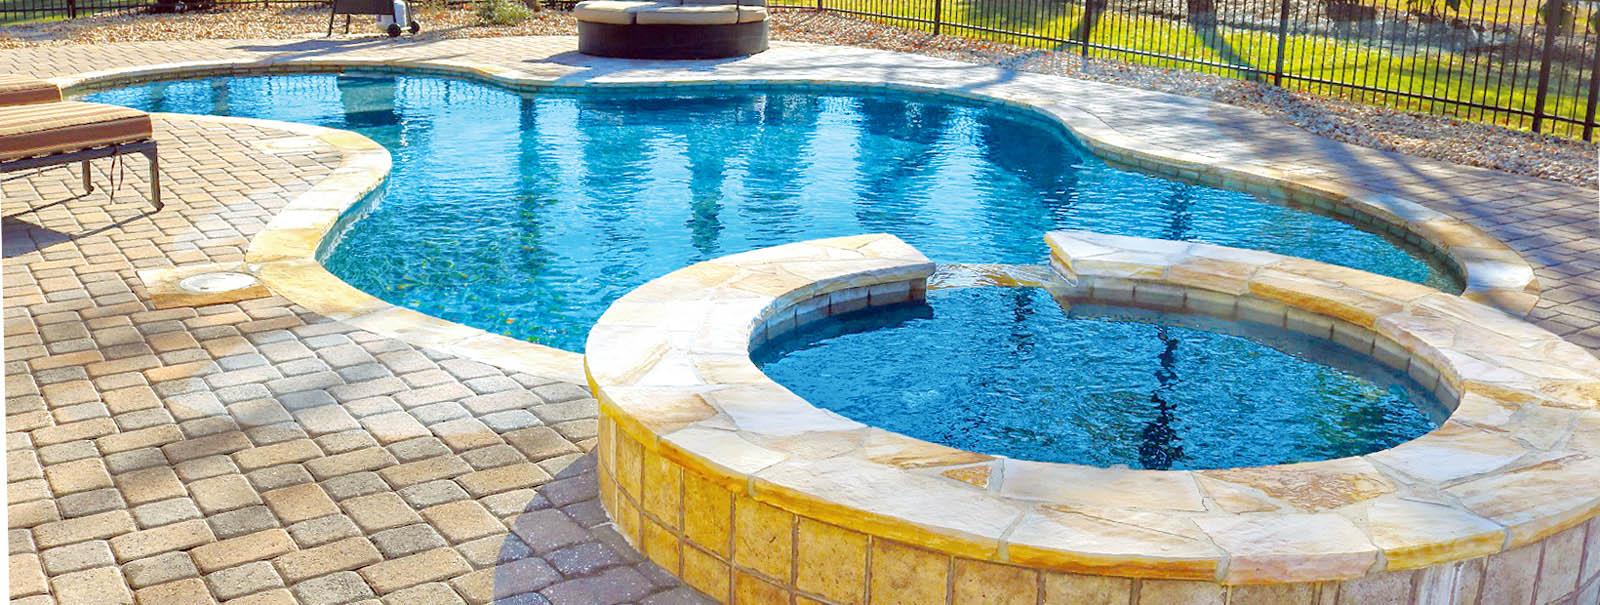 Custom Inground Pool Builder Birmingham Al